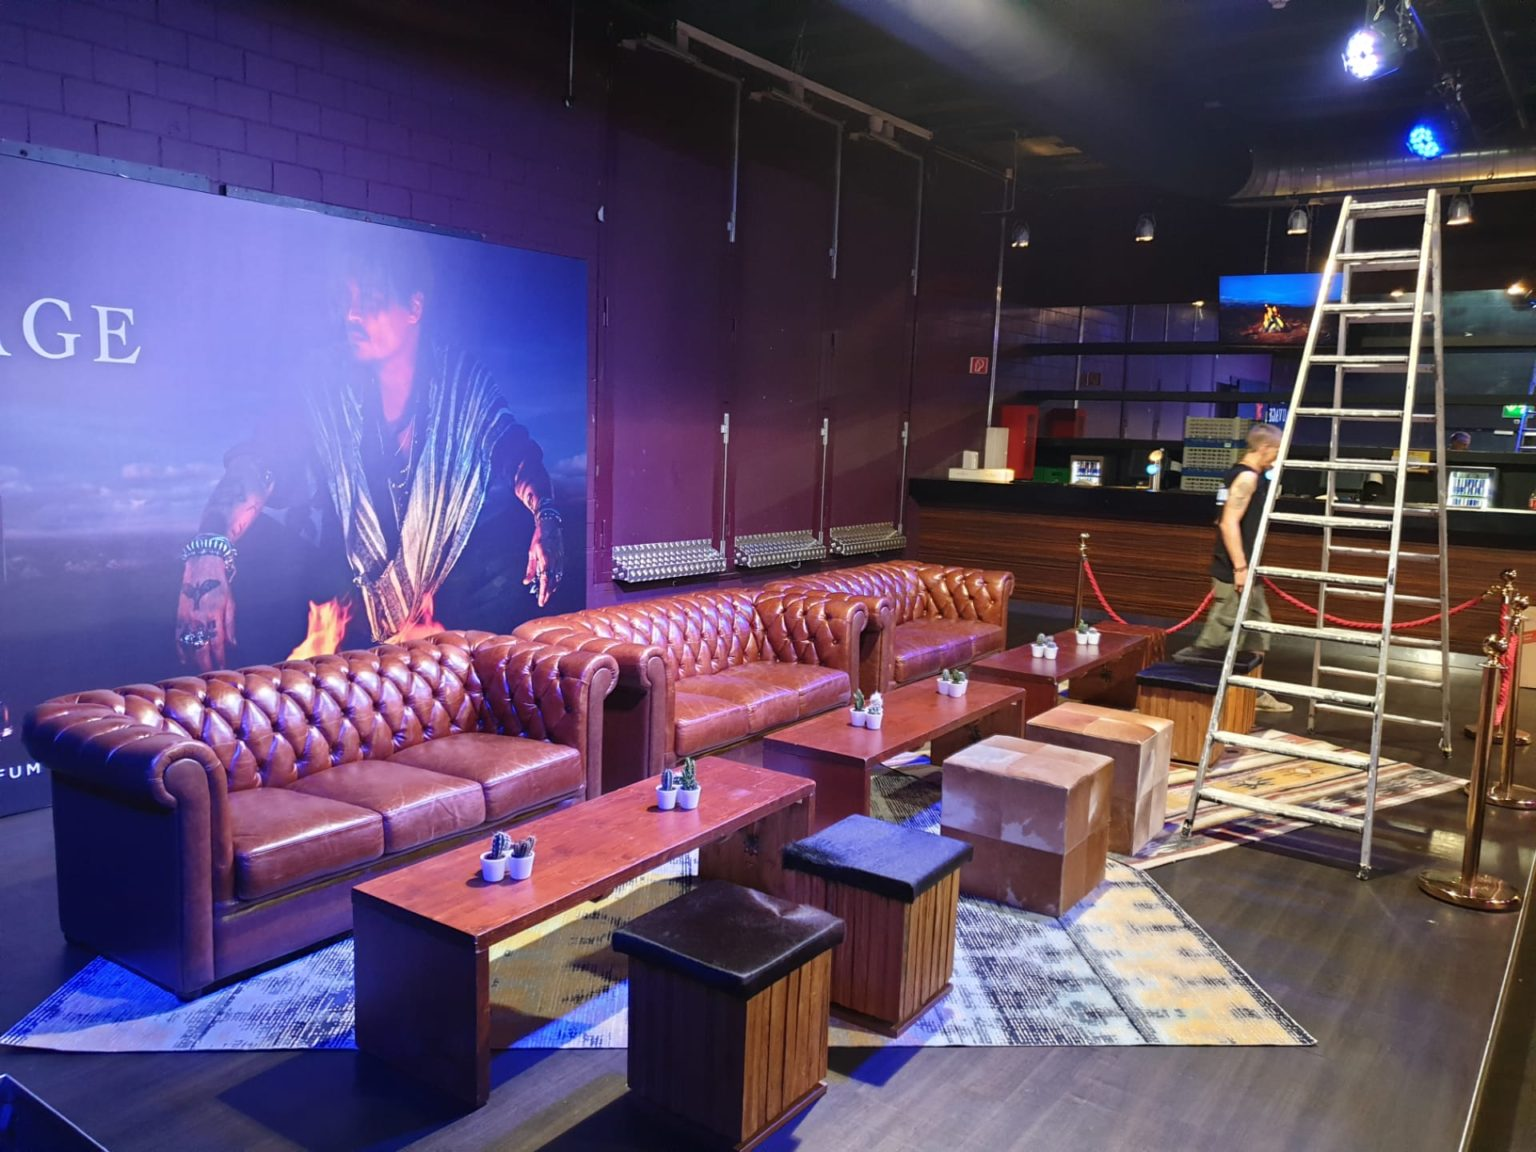 chesterfield english 3er sofa mieten rent-a-lounge 1